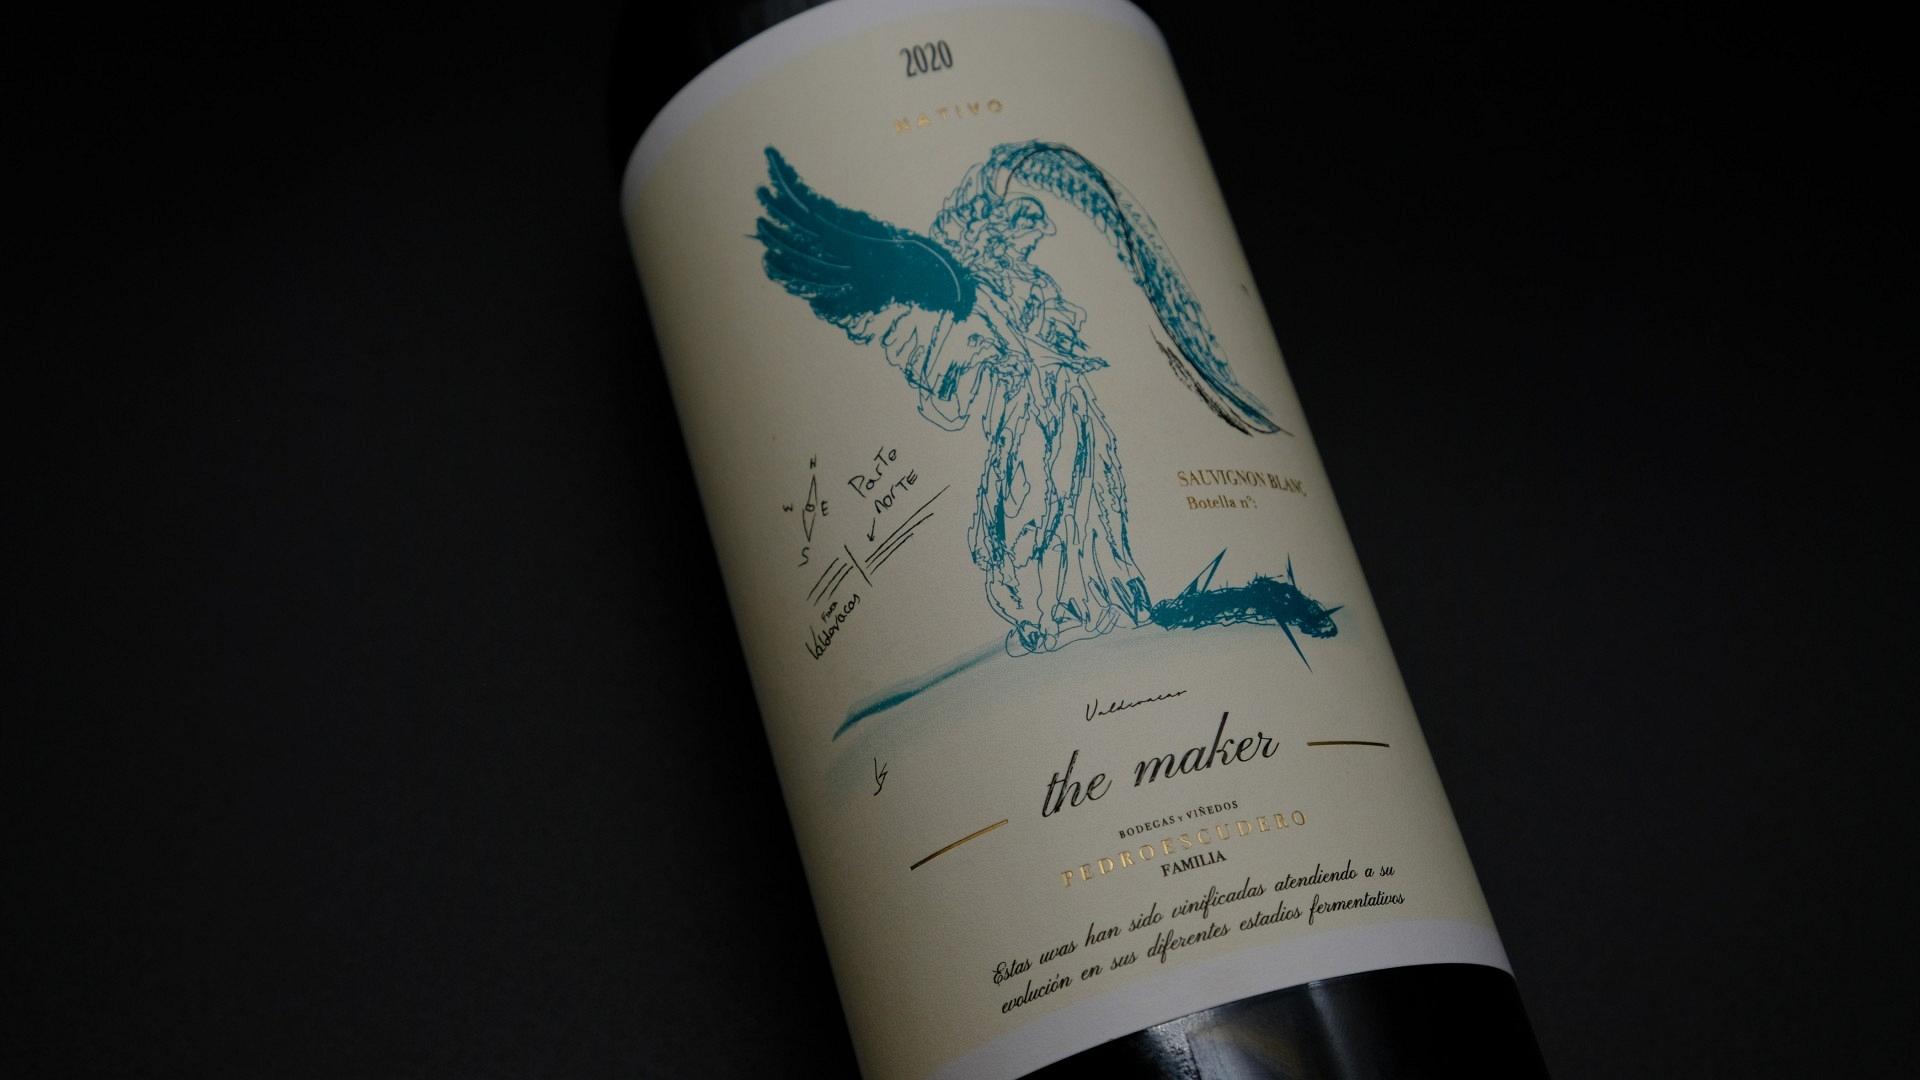 -THE MAKER - Sauvignon Blanc, the dynasty grows